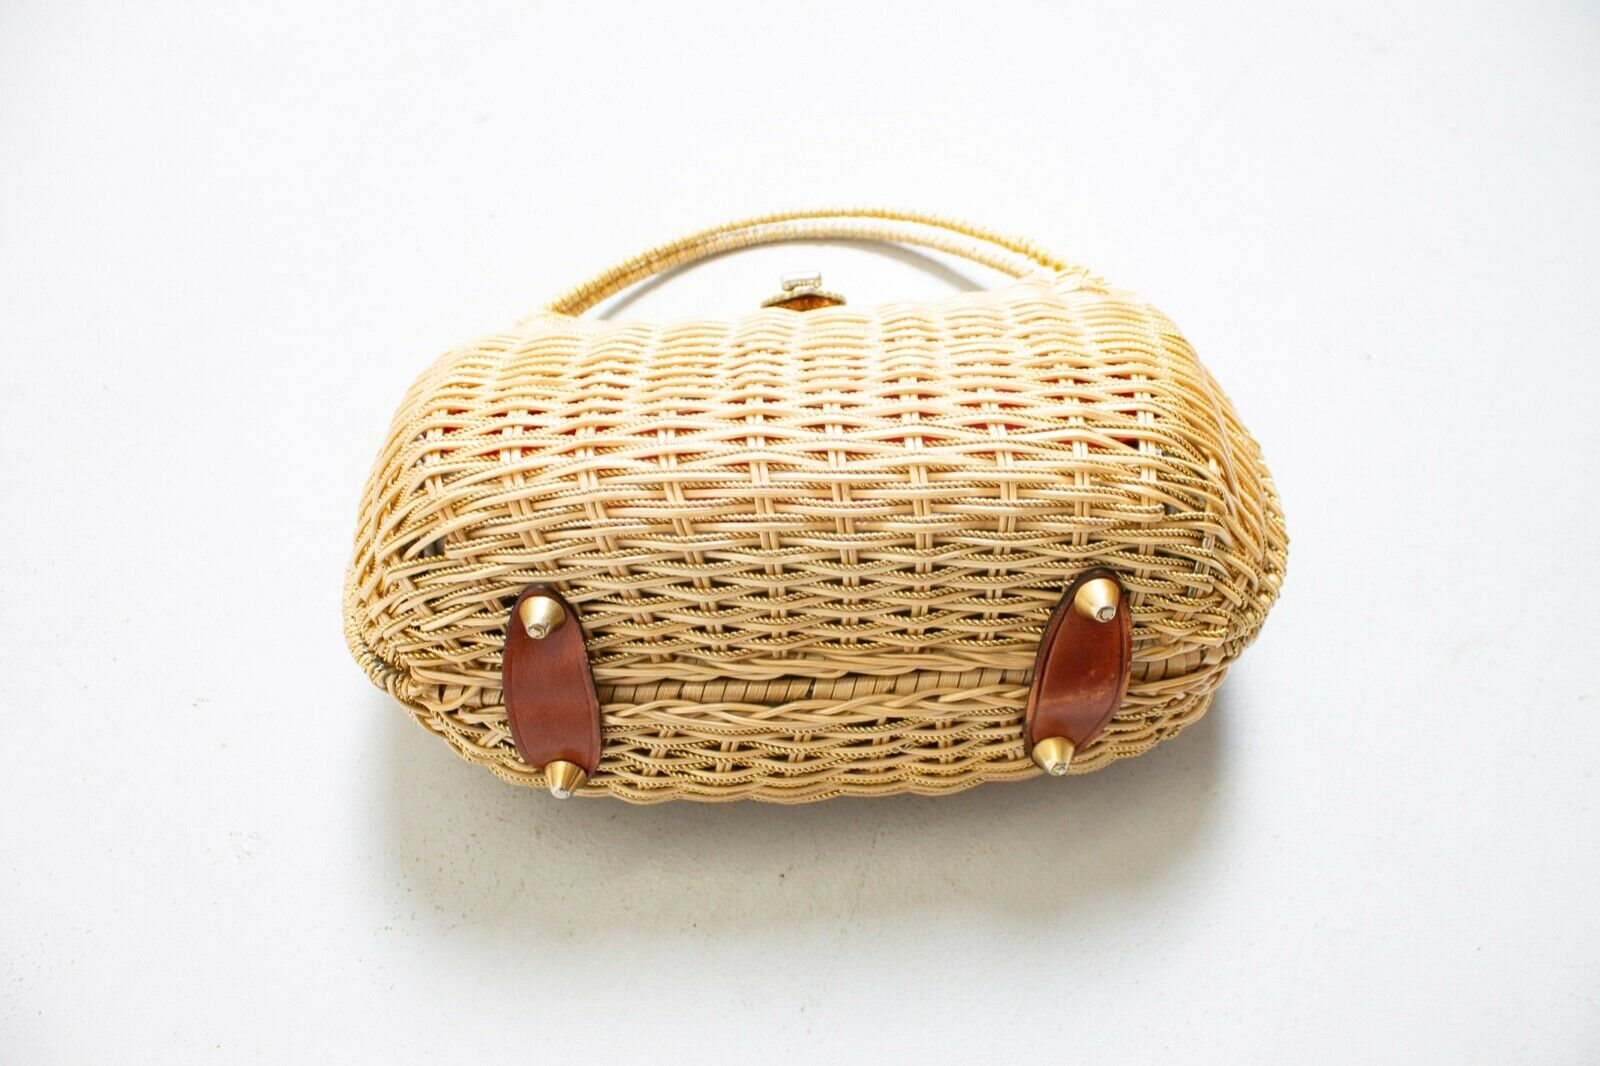 Vintage Basket Purse 1960s Gold Metal Woven Wicke… - image 2